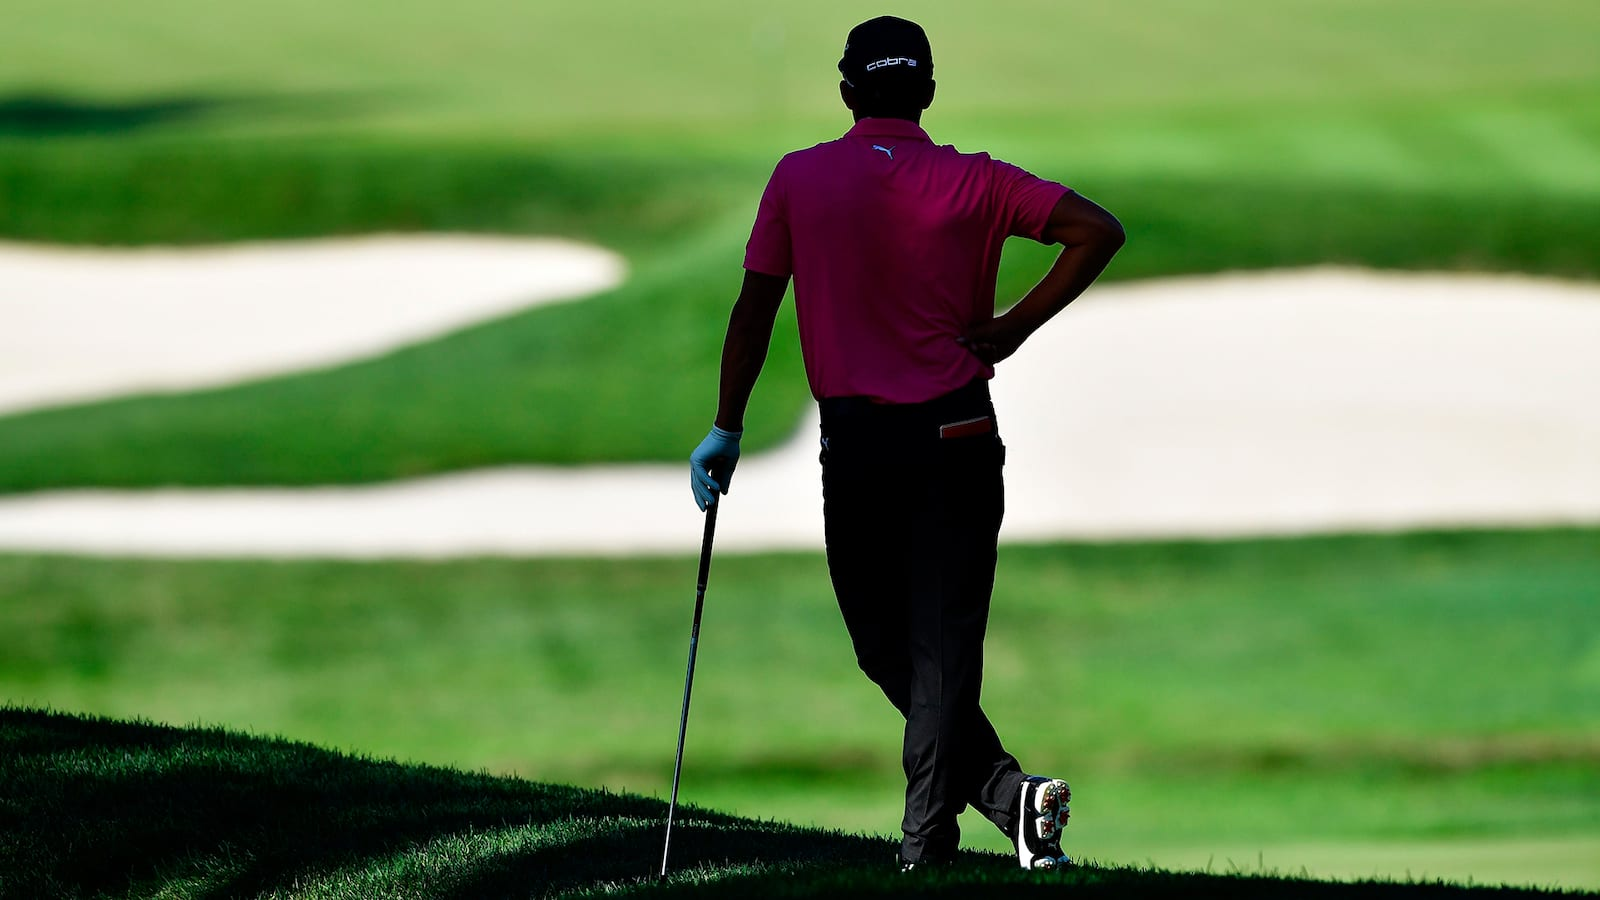 golf/golf